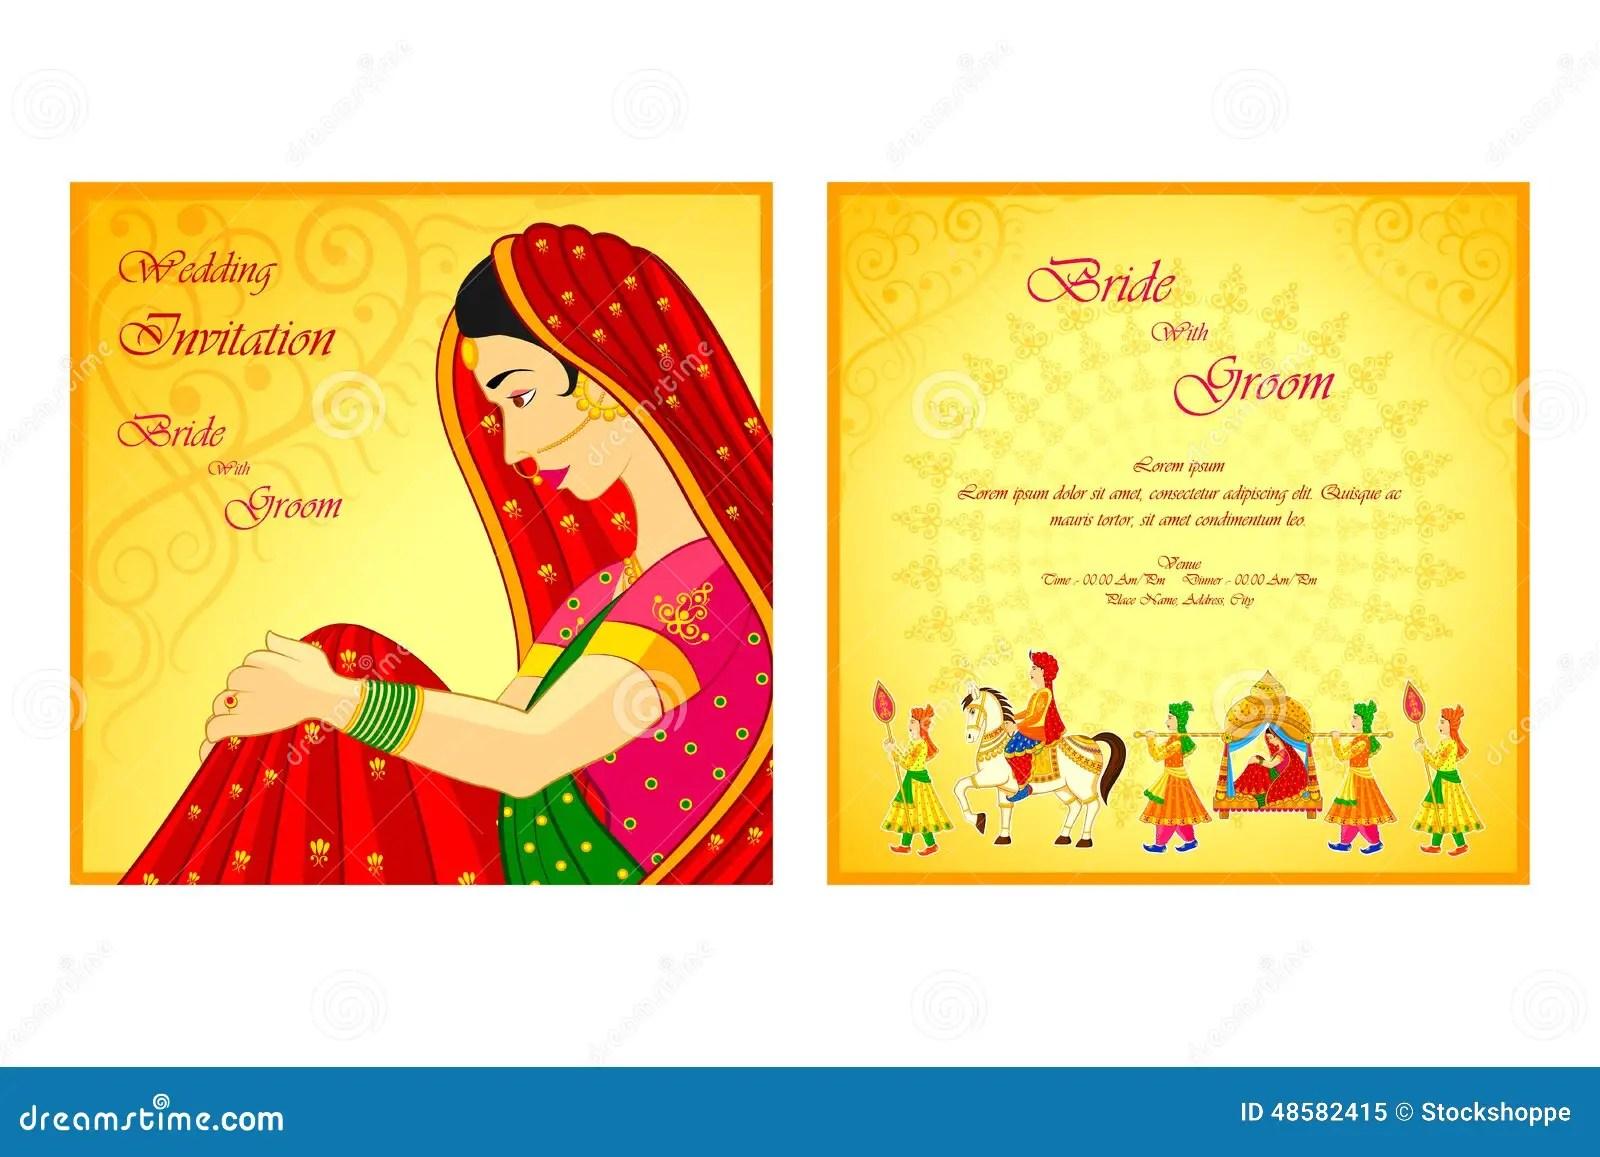 stock illustration indian wedding invitation card vector illustration image indian wedding invitation Indian wedding invitation card Royalty Free Stock Photo